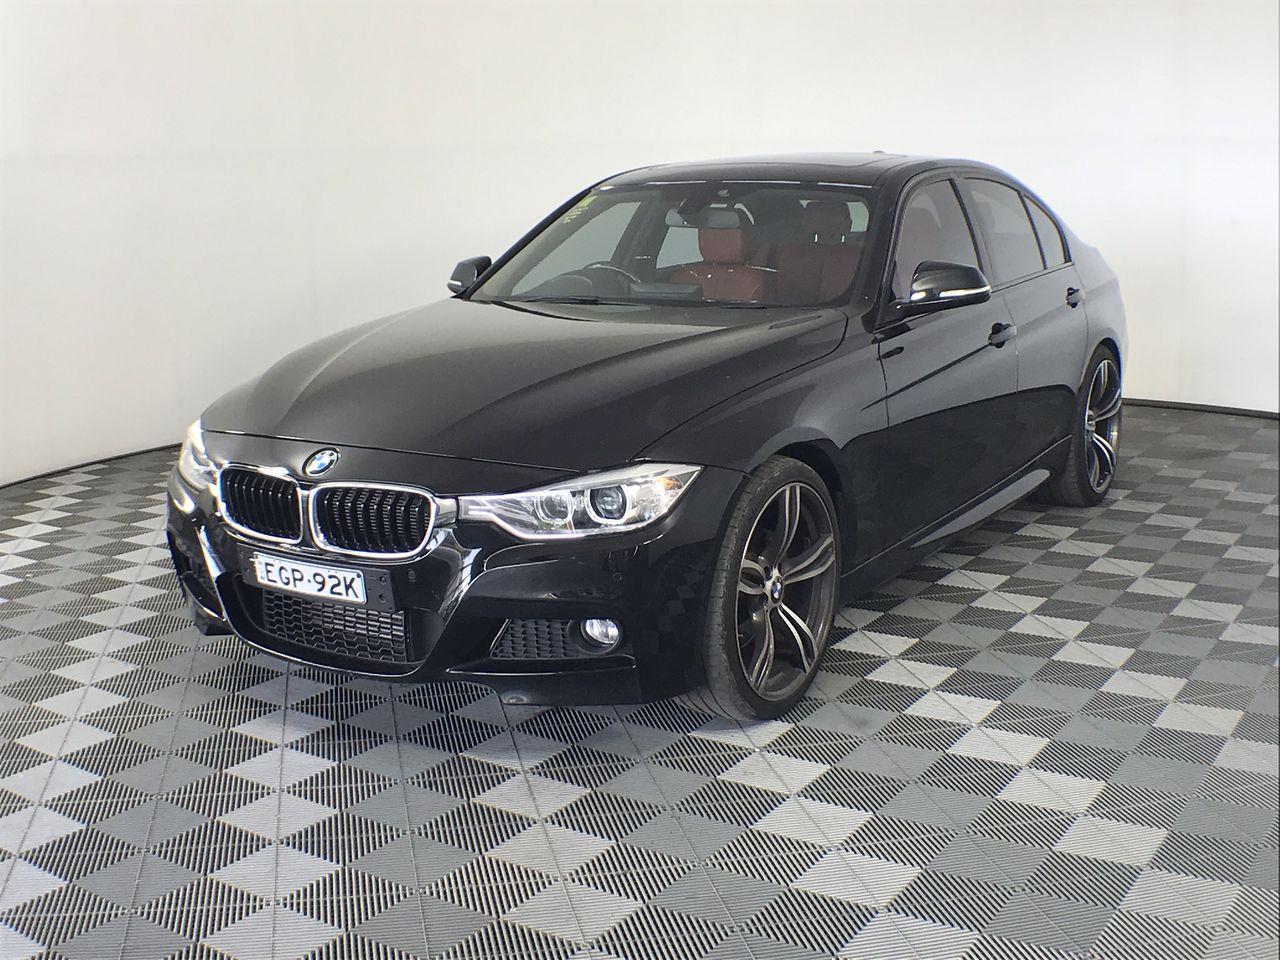 2013 BMW 3 Series 328i F30 Automatic - 8 Speed Sedan